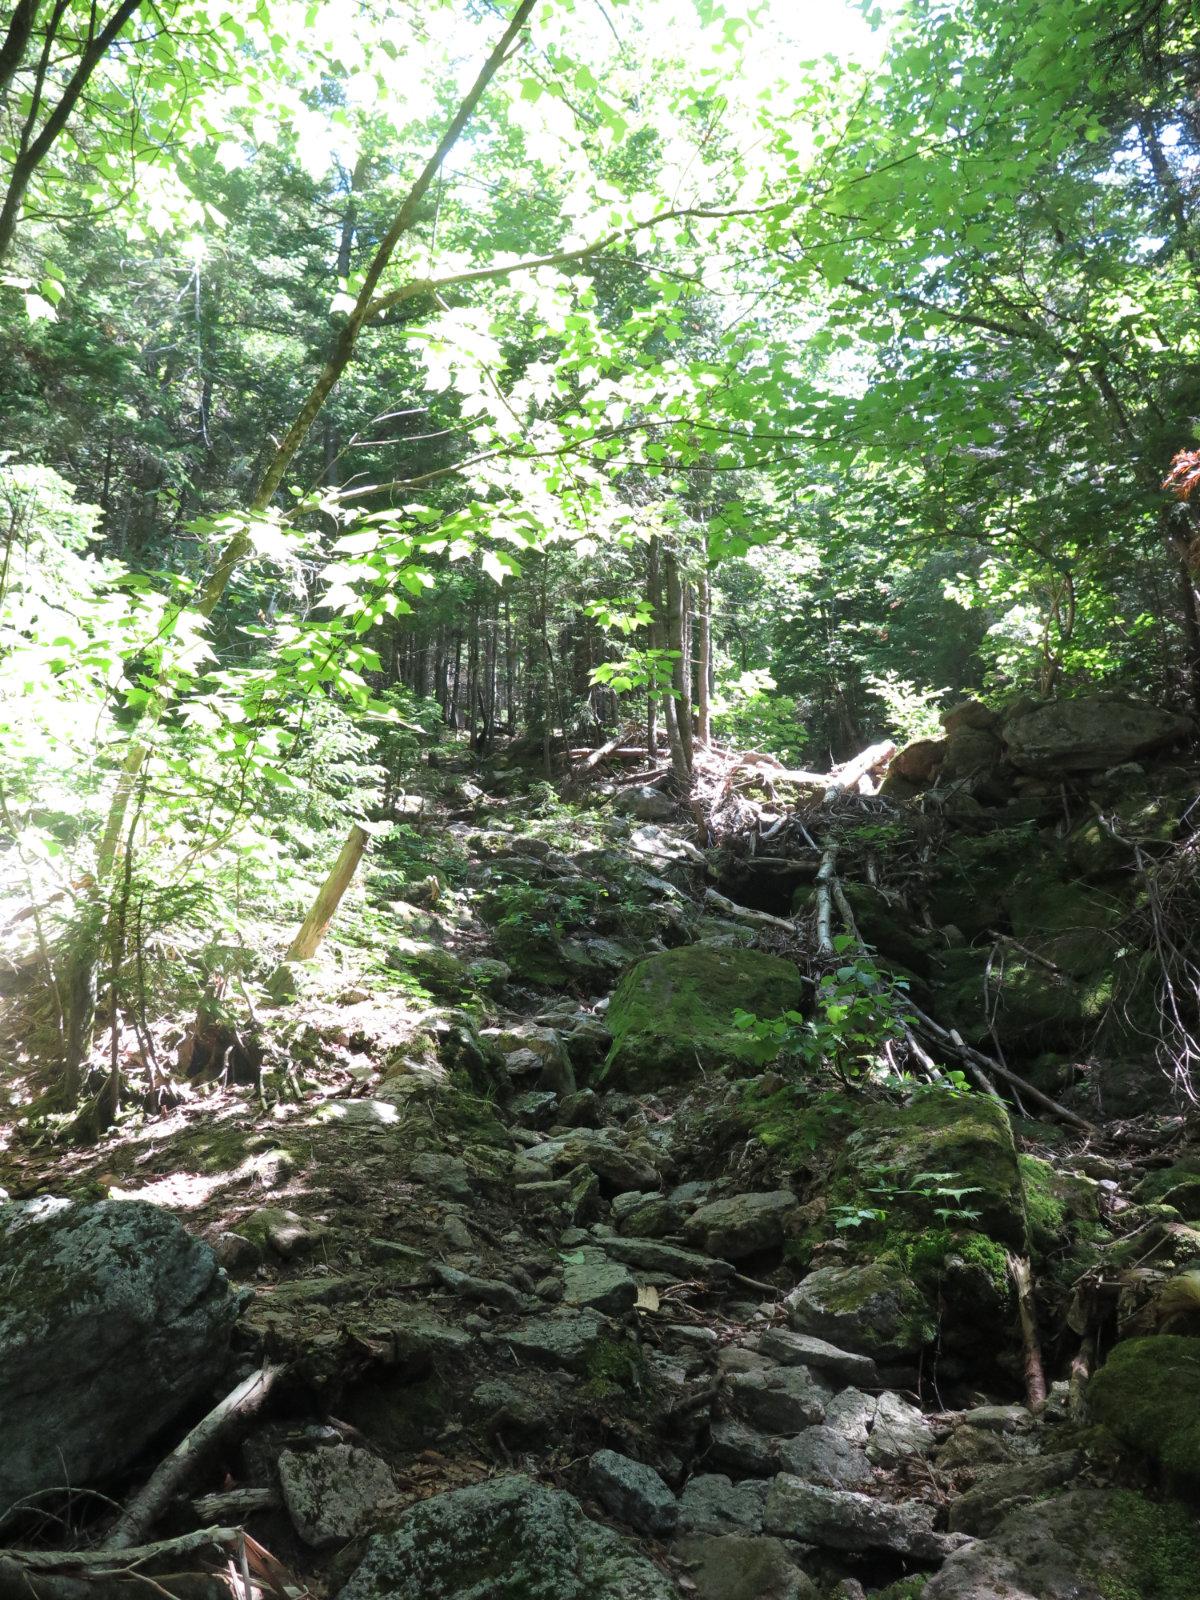 Low_Trail_Rough_Tripyramid_20190720